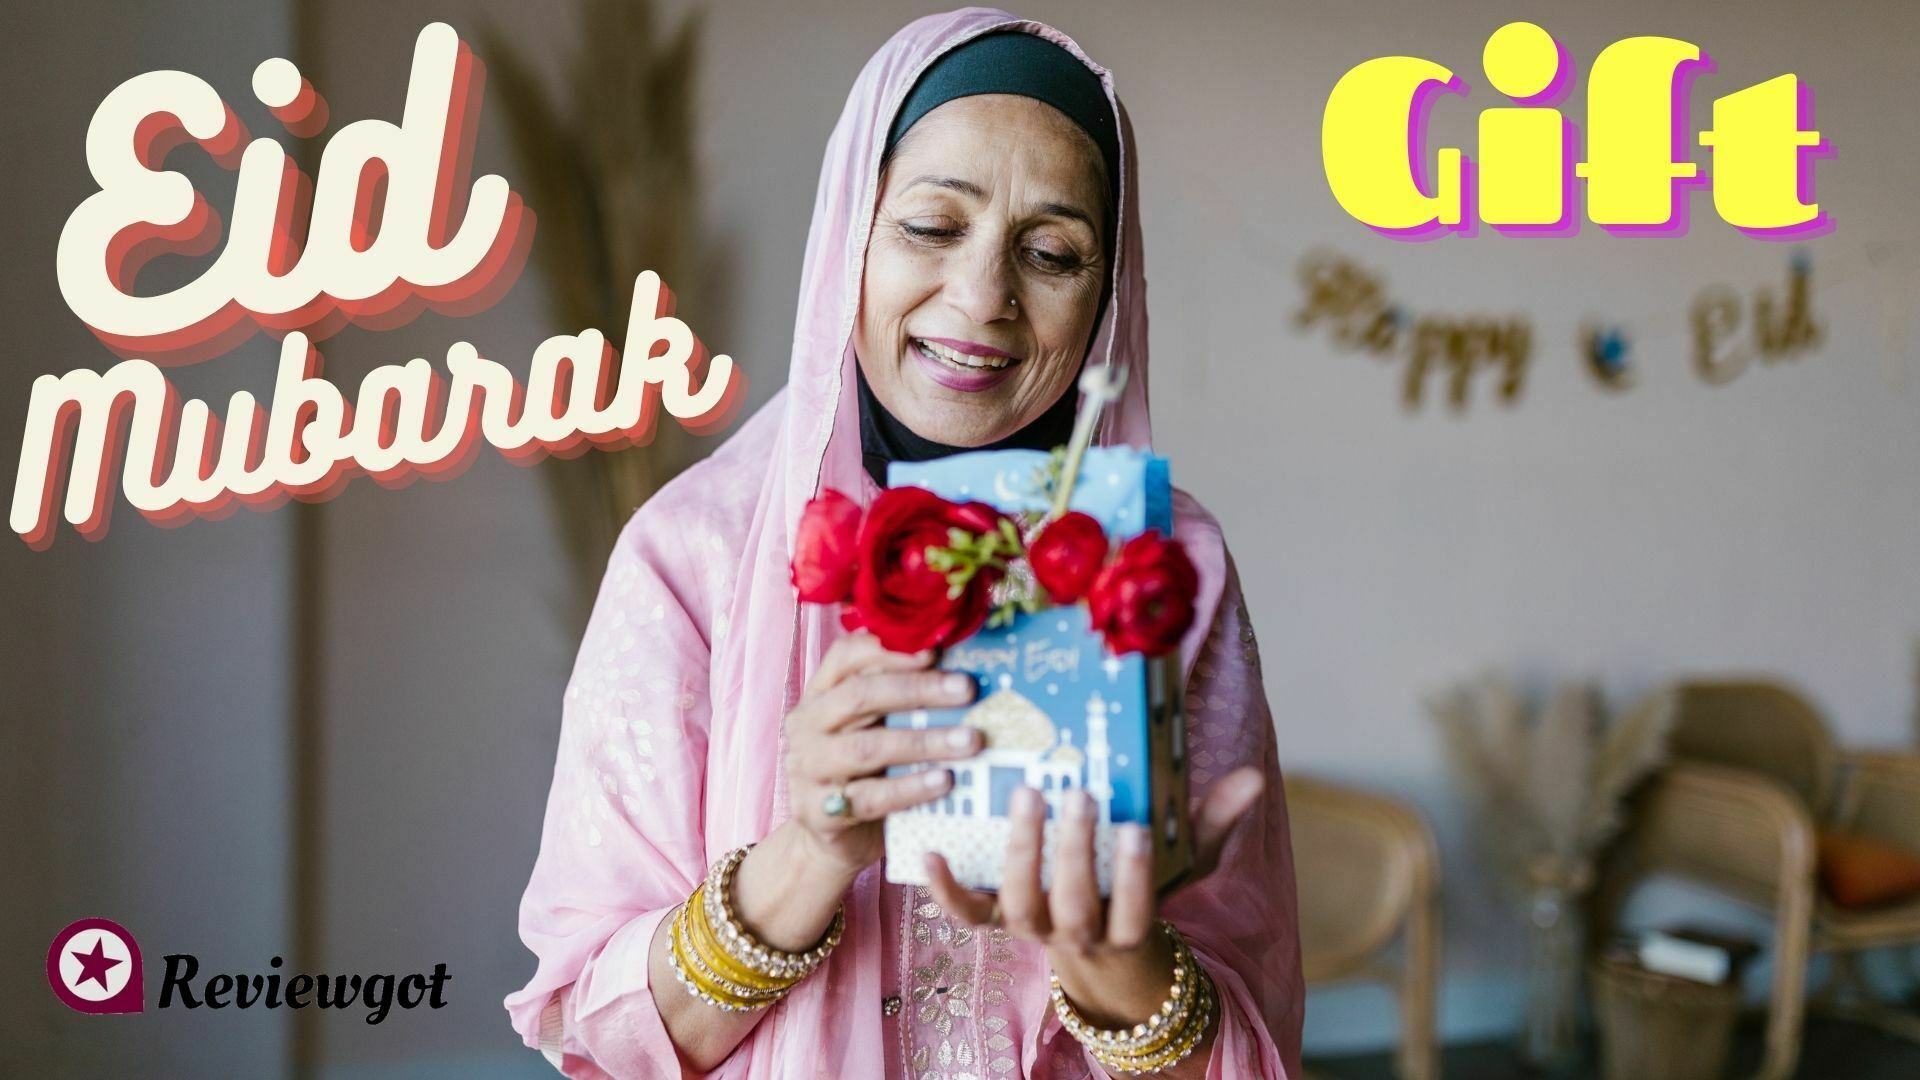 Eid Mubarak Gift